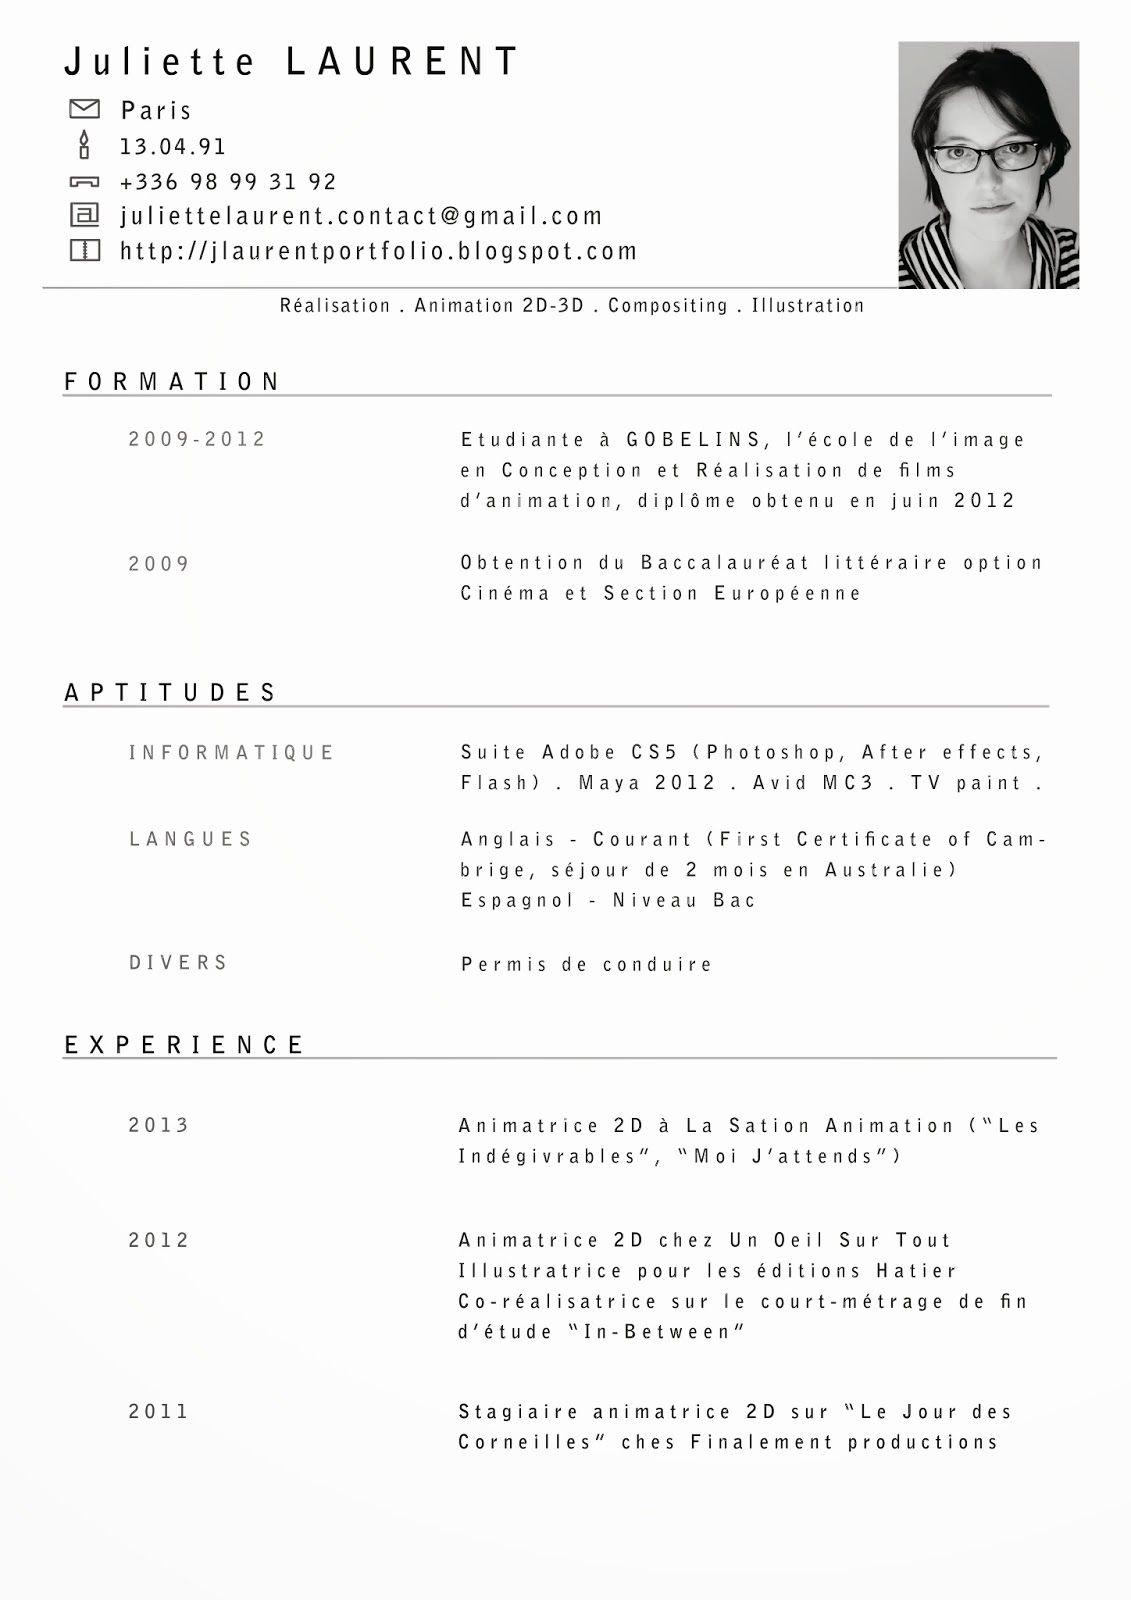 Cv En Ligne English Cv Anonyme Curriculum Vitae Cv Etudiant Cv Francais